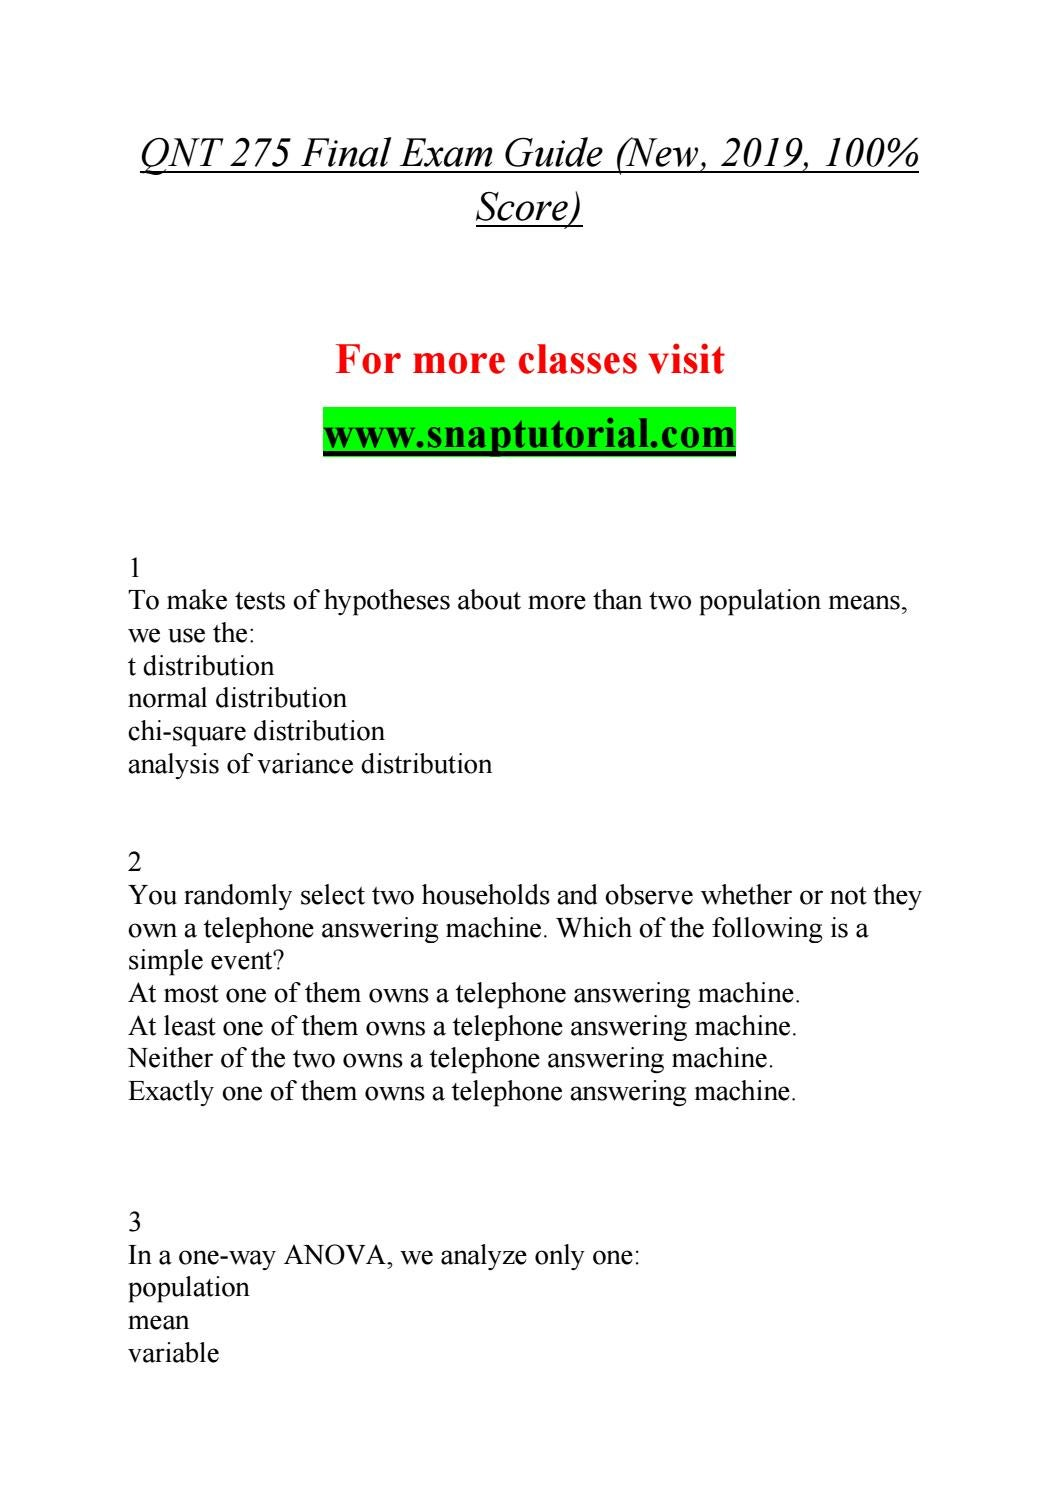 QNT 275 Enhance teaching / snaptutorial com by Bailey297 - issuu